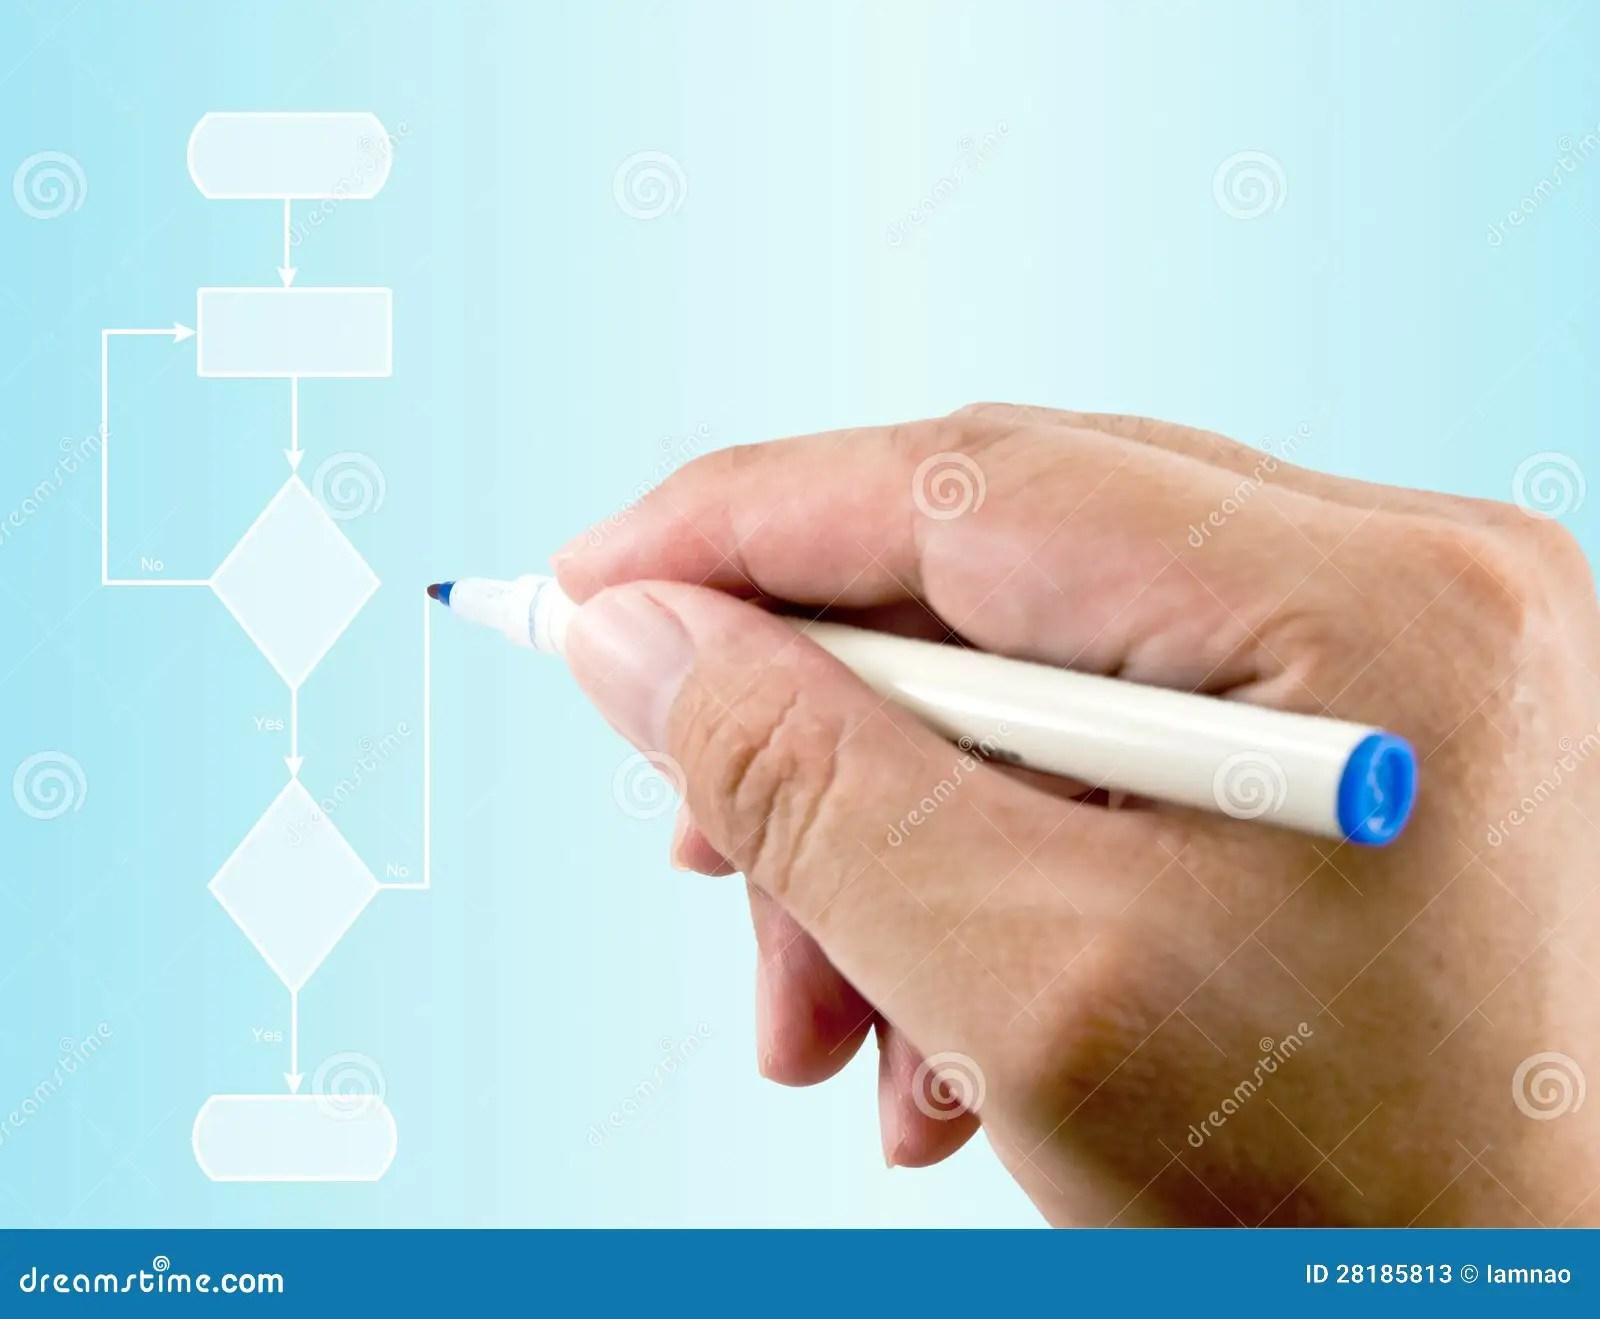 risk decision tree diagram 1999 ford mustang spark plug wiring stock image cartoondealer 22701805